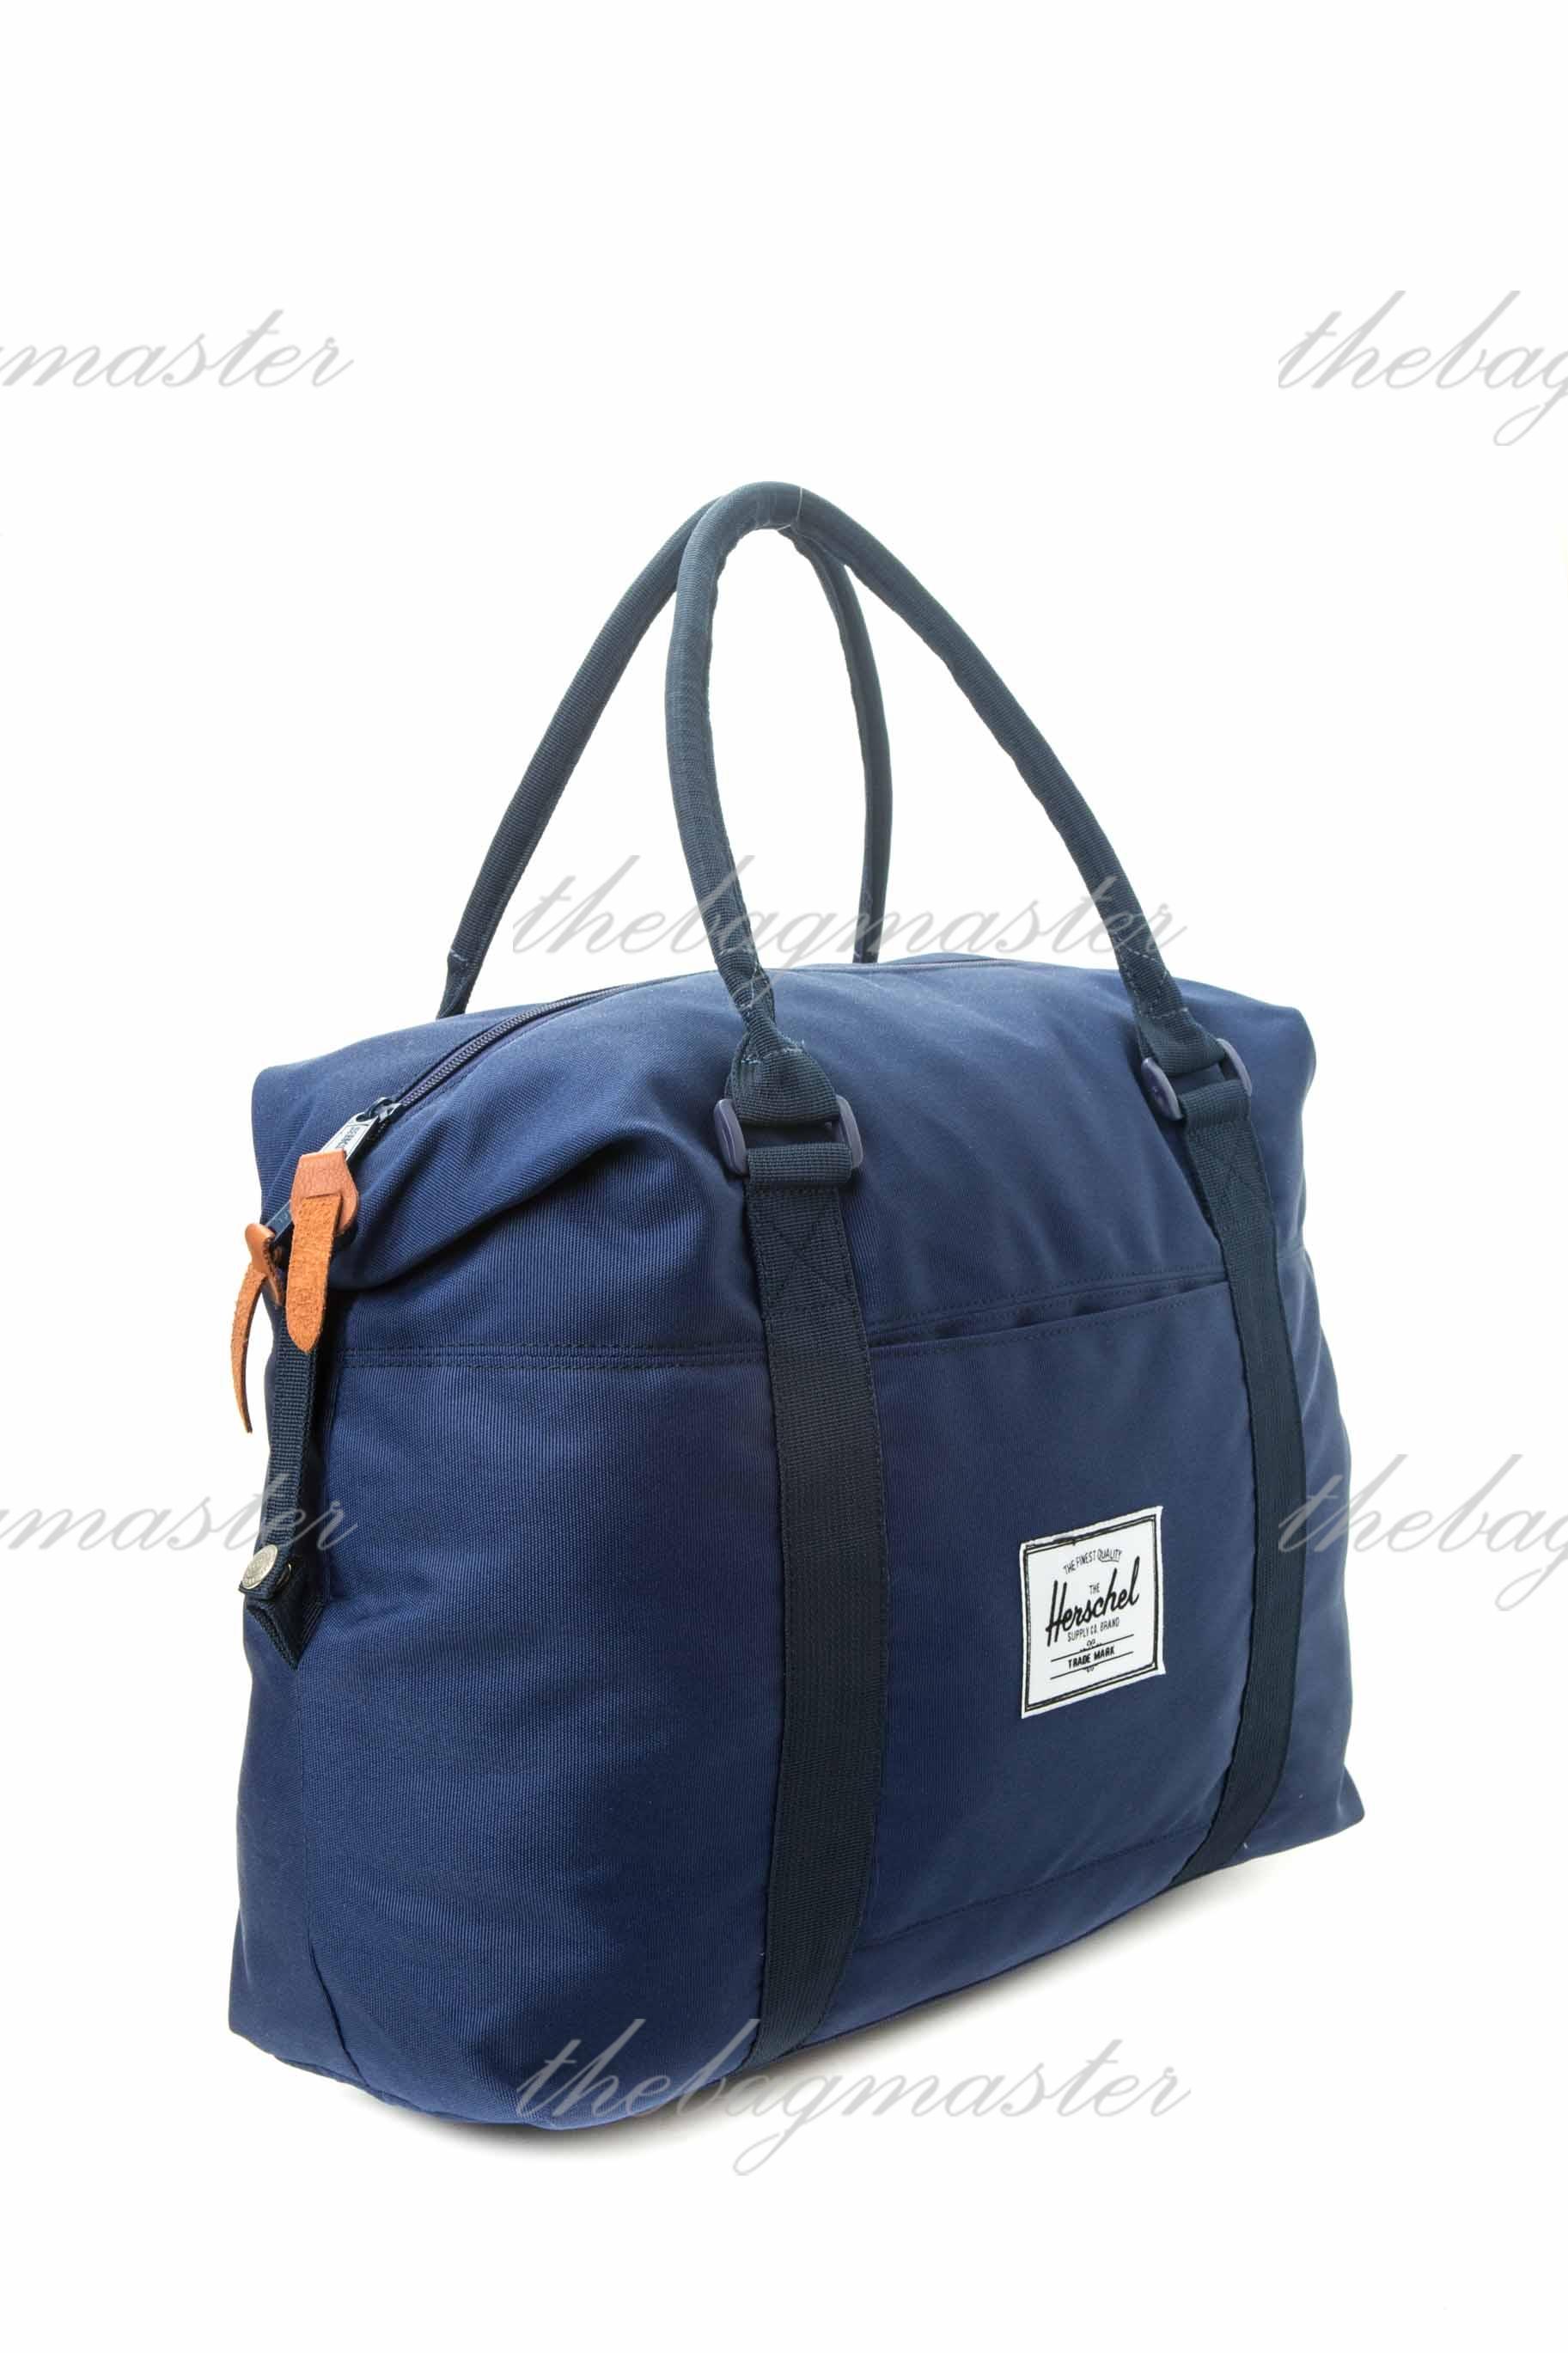 Herschel Duffle Bag | Hershel Duffle | Herschel Duffle Bag